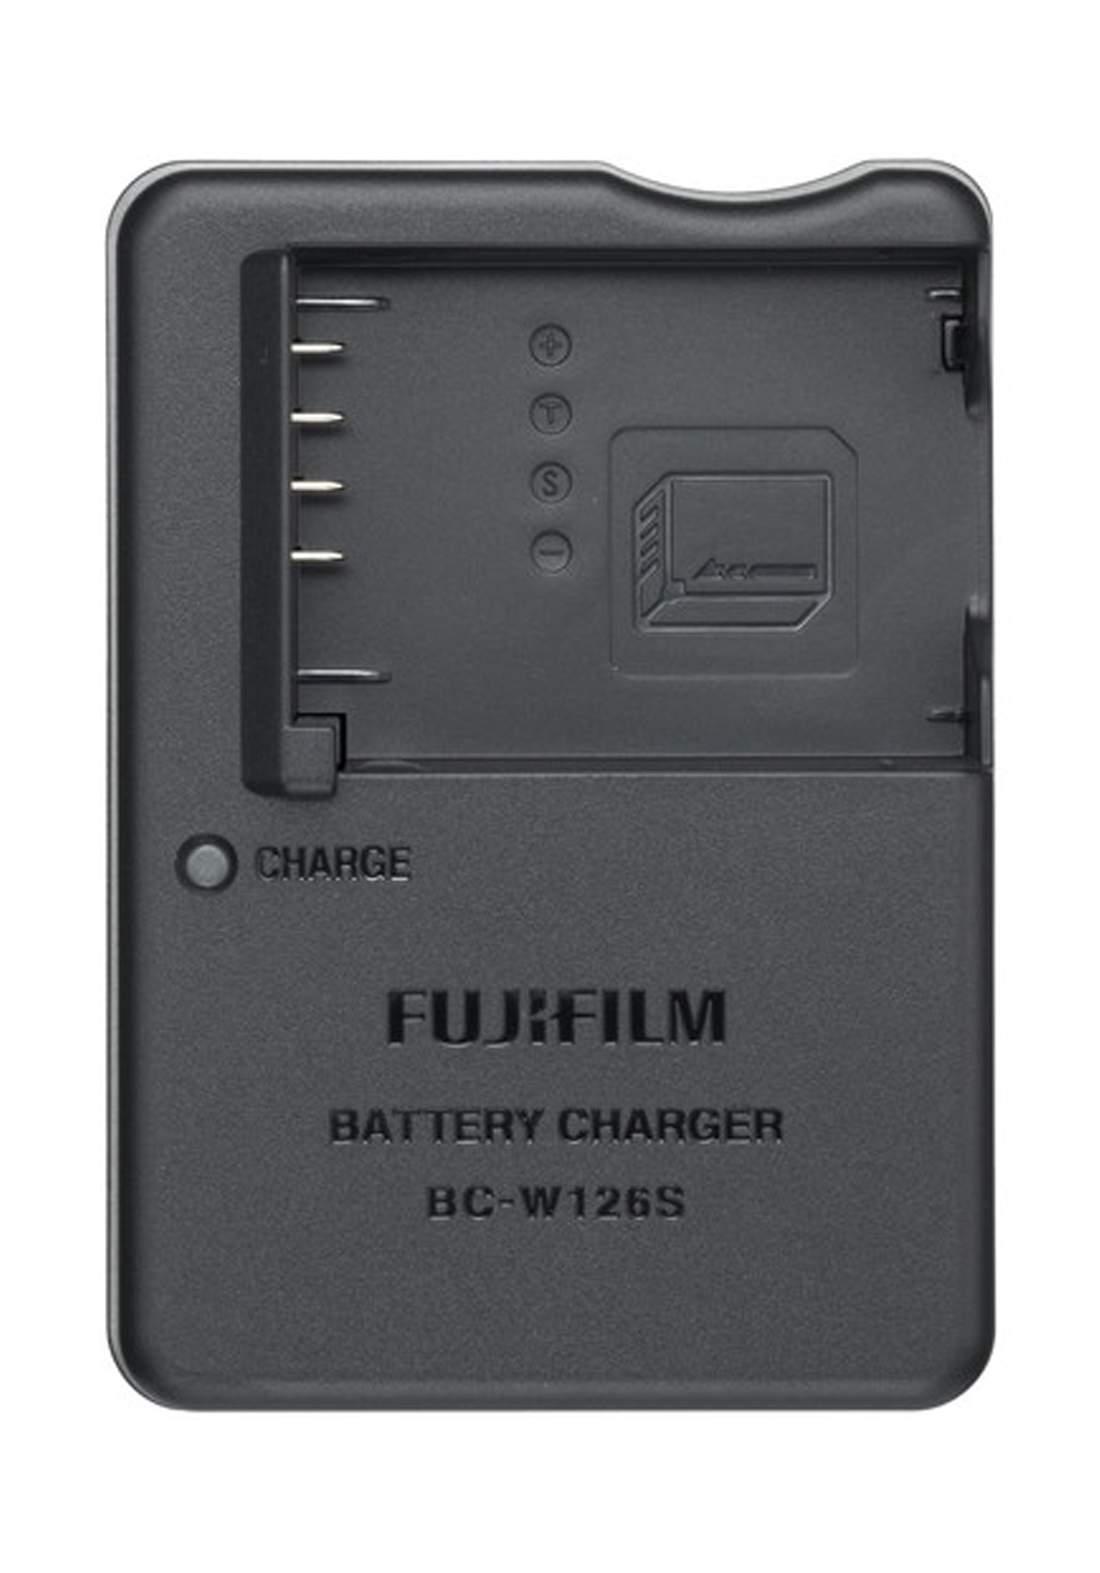 Fujifilm BC-W126S Battery Charger  - Black    شاحن بطارية كاميرا